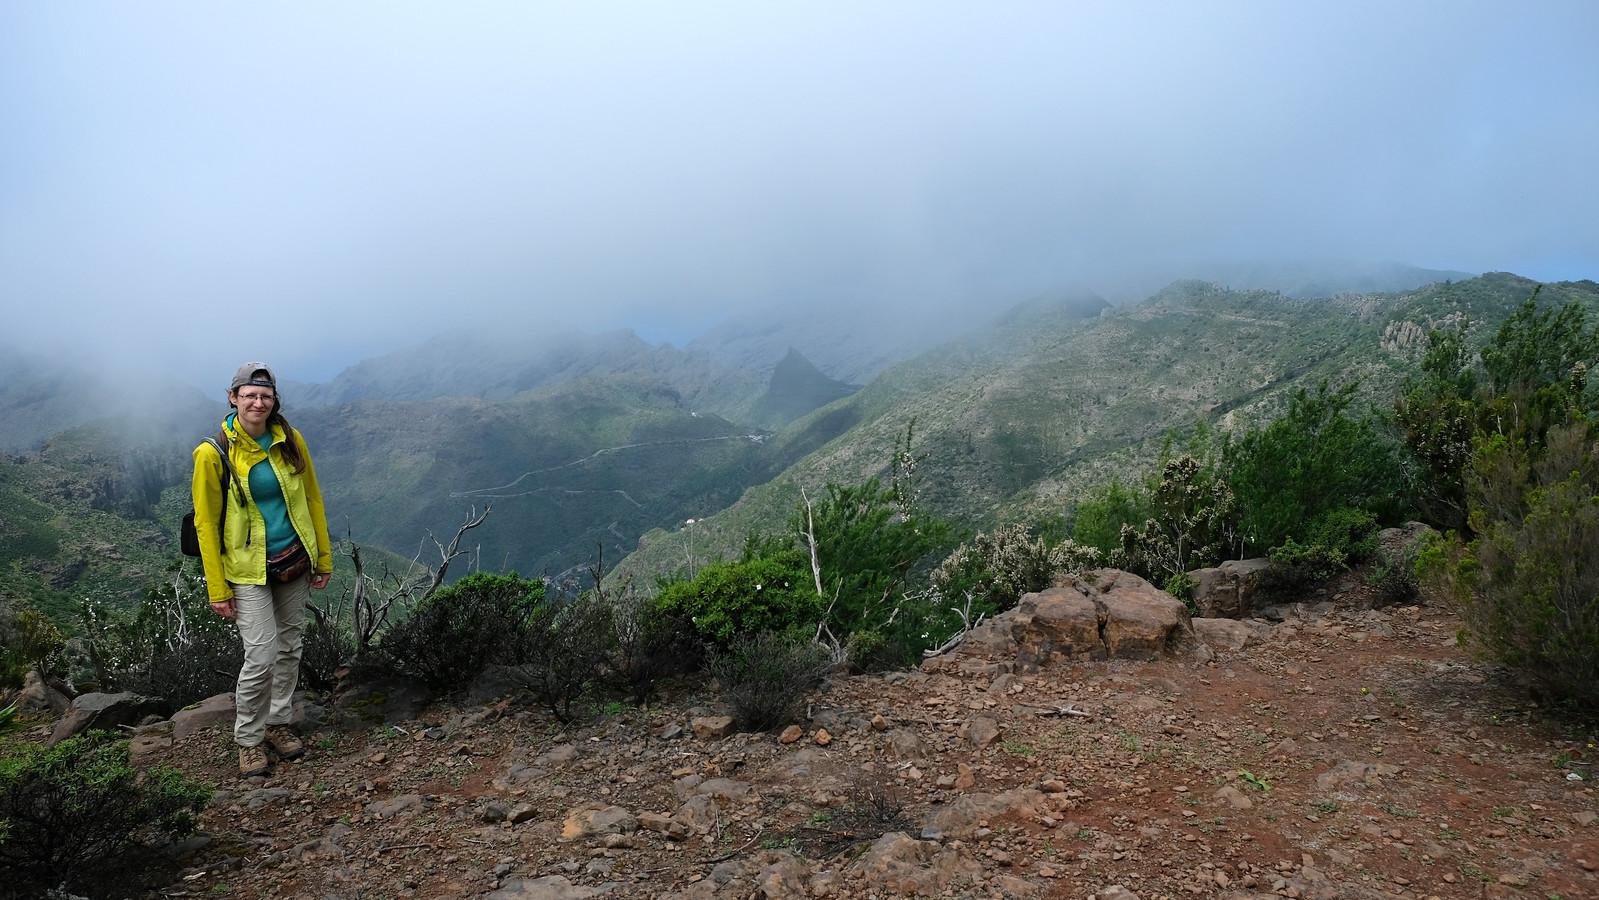 Teno Rural Park, Tenerife, Canary Islands, Spain